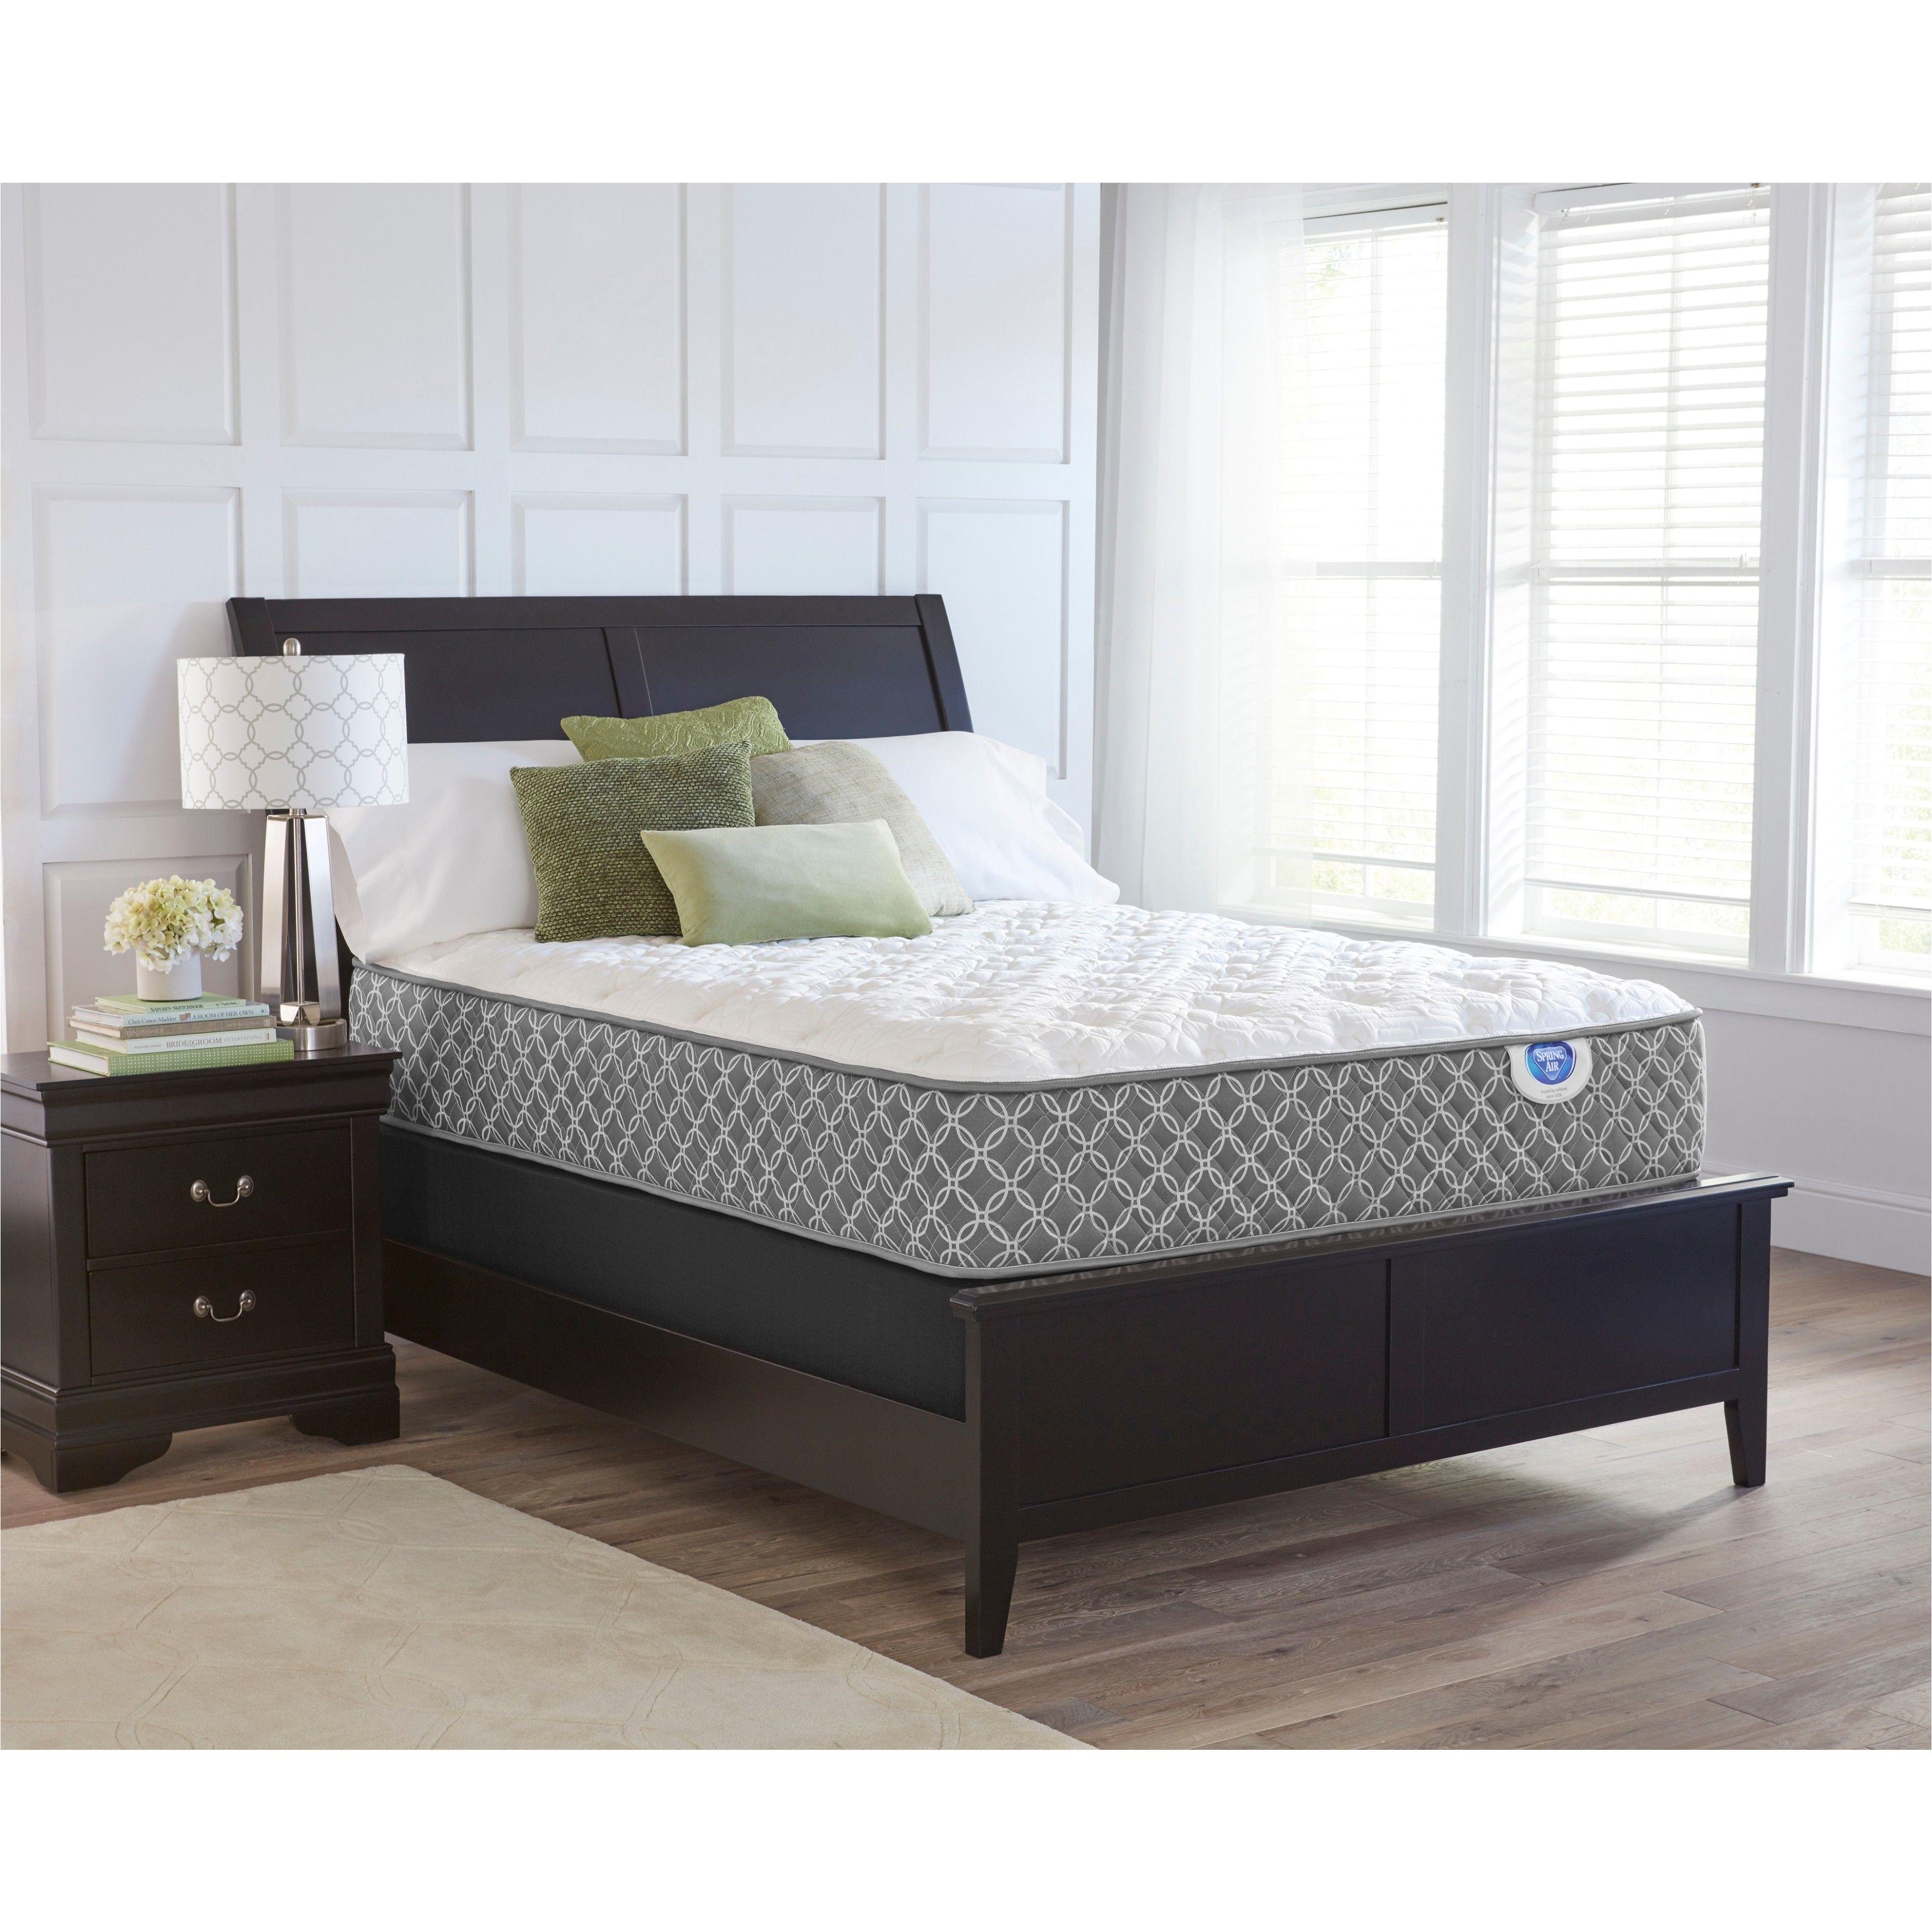 spring air bailey plush twin xl size mattress set mattresses white